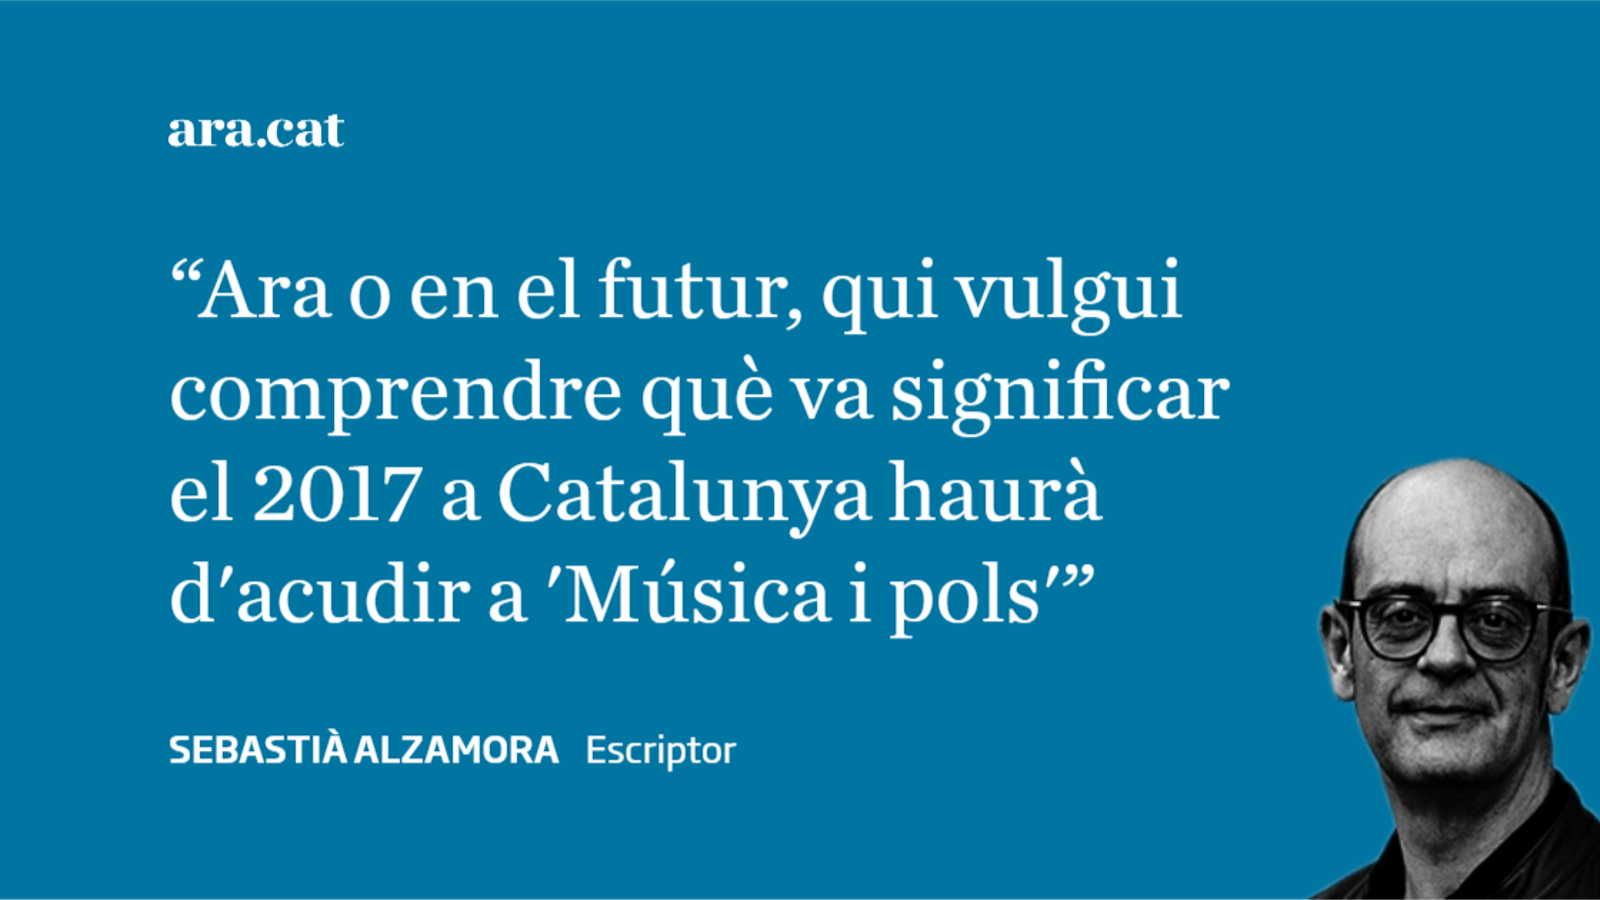 Carme Forcadell, Pere Rovira, música i pols